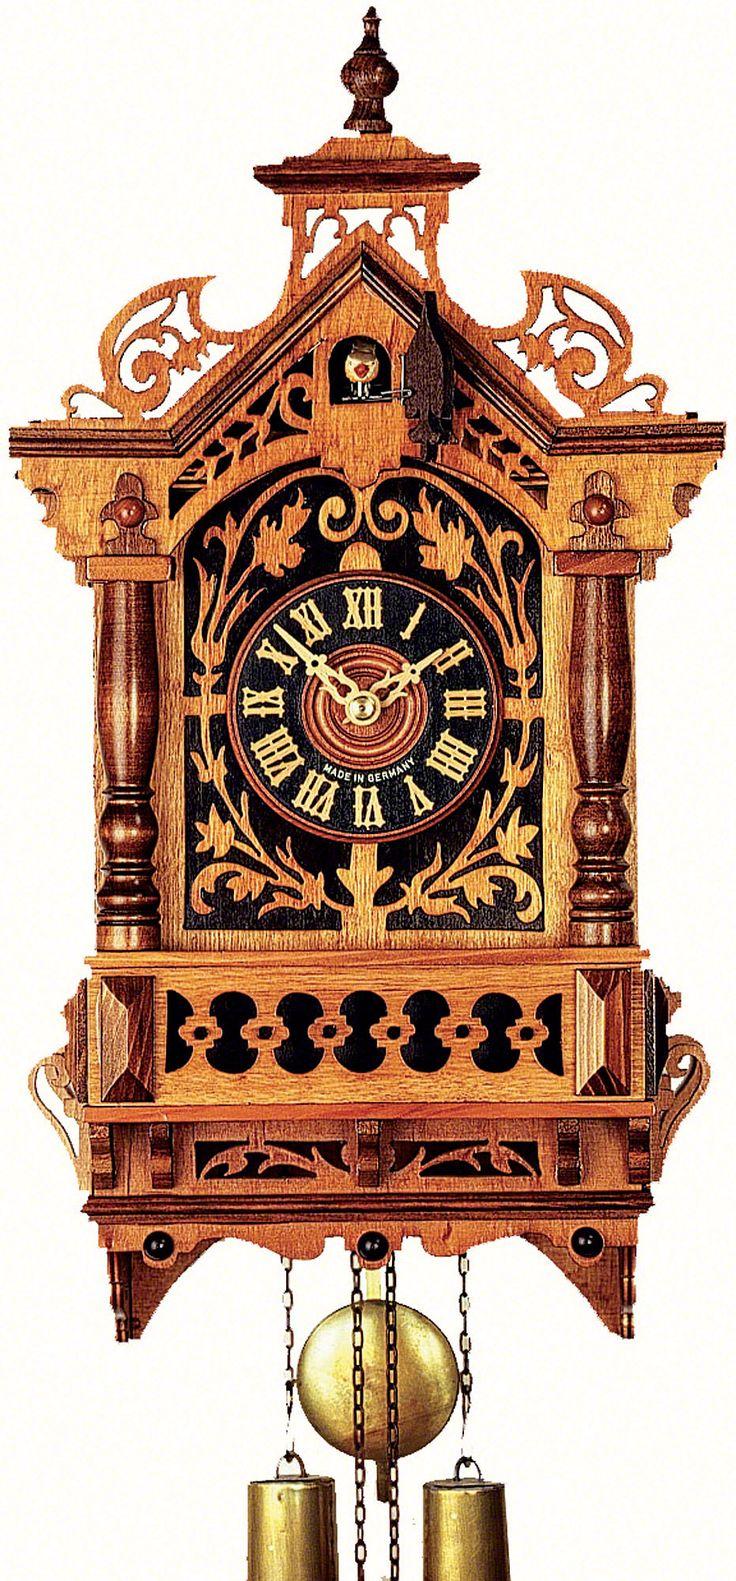 Reloj de cuco estilo antiguo movimiento mecánico de 8 días 44cm de Rombach & Haas